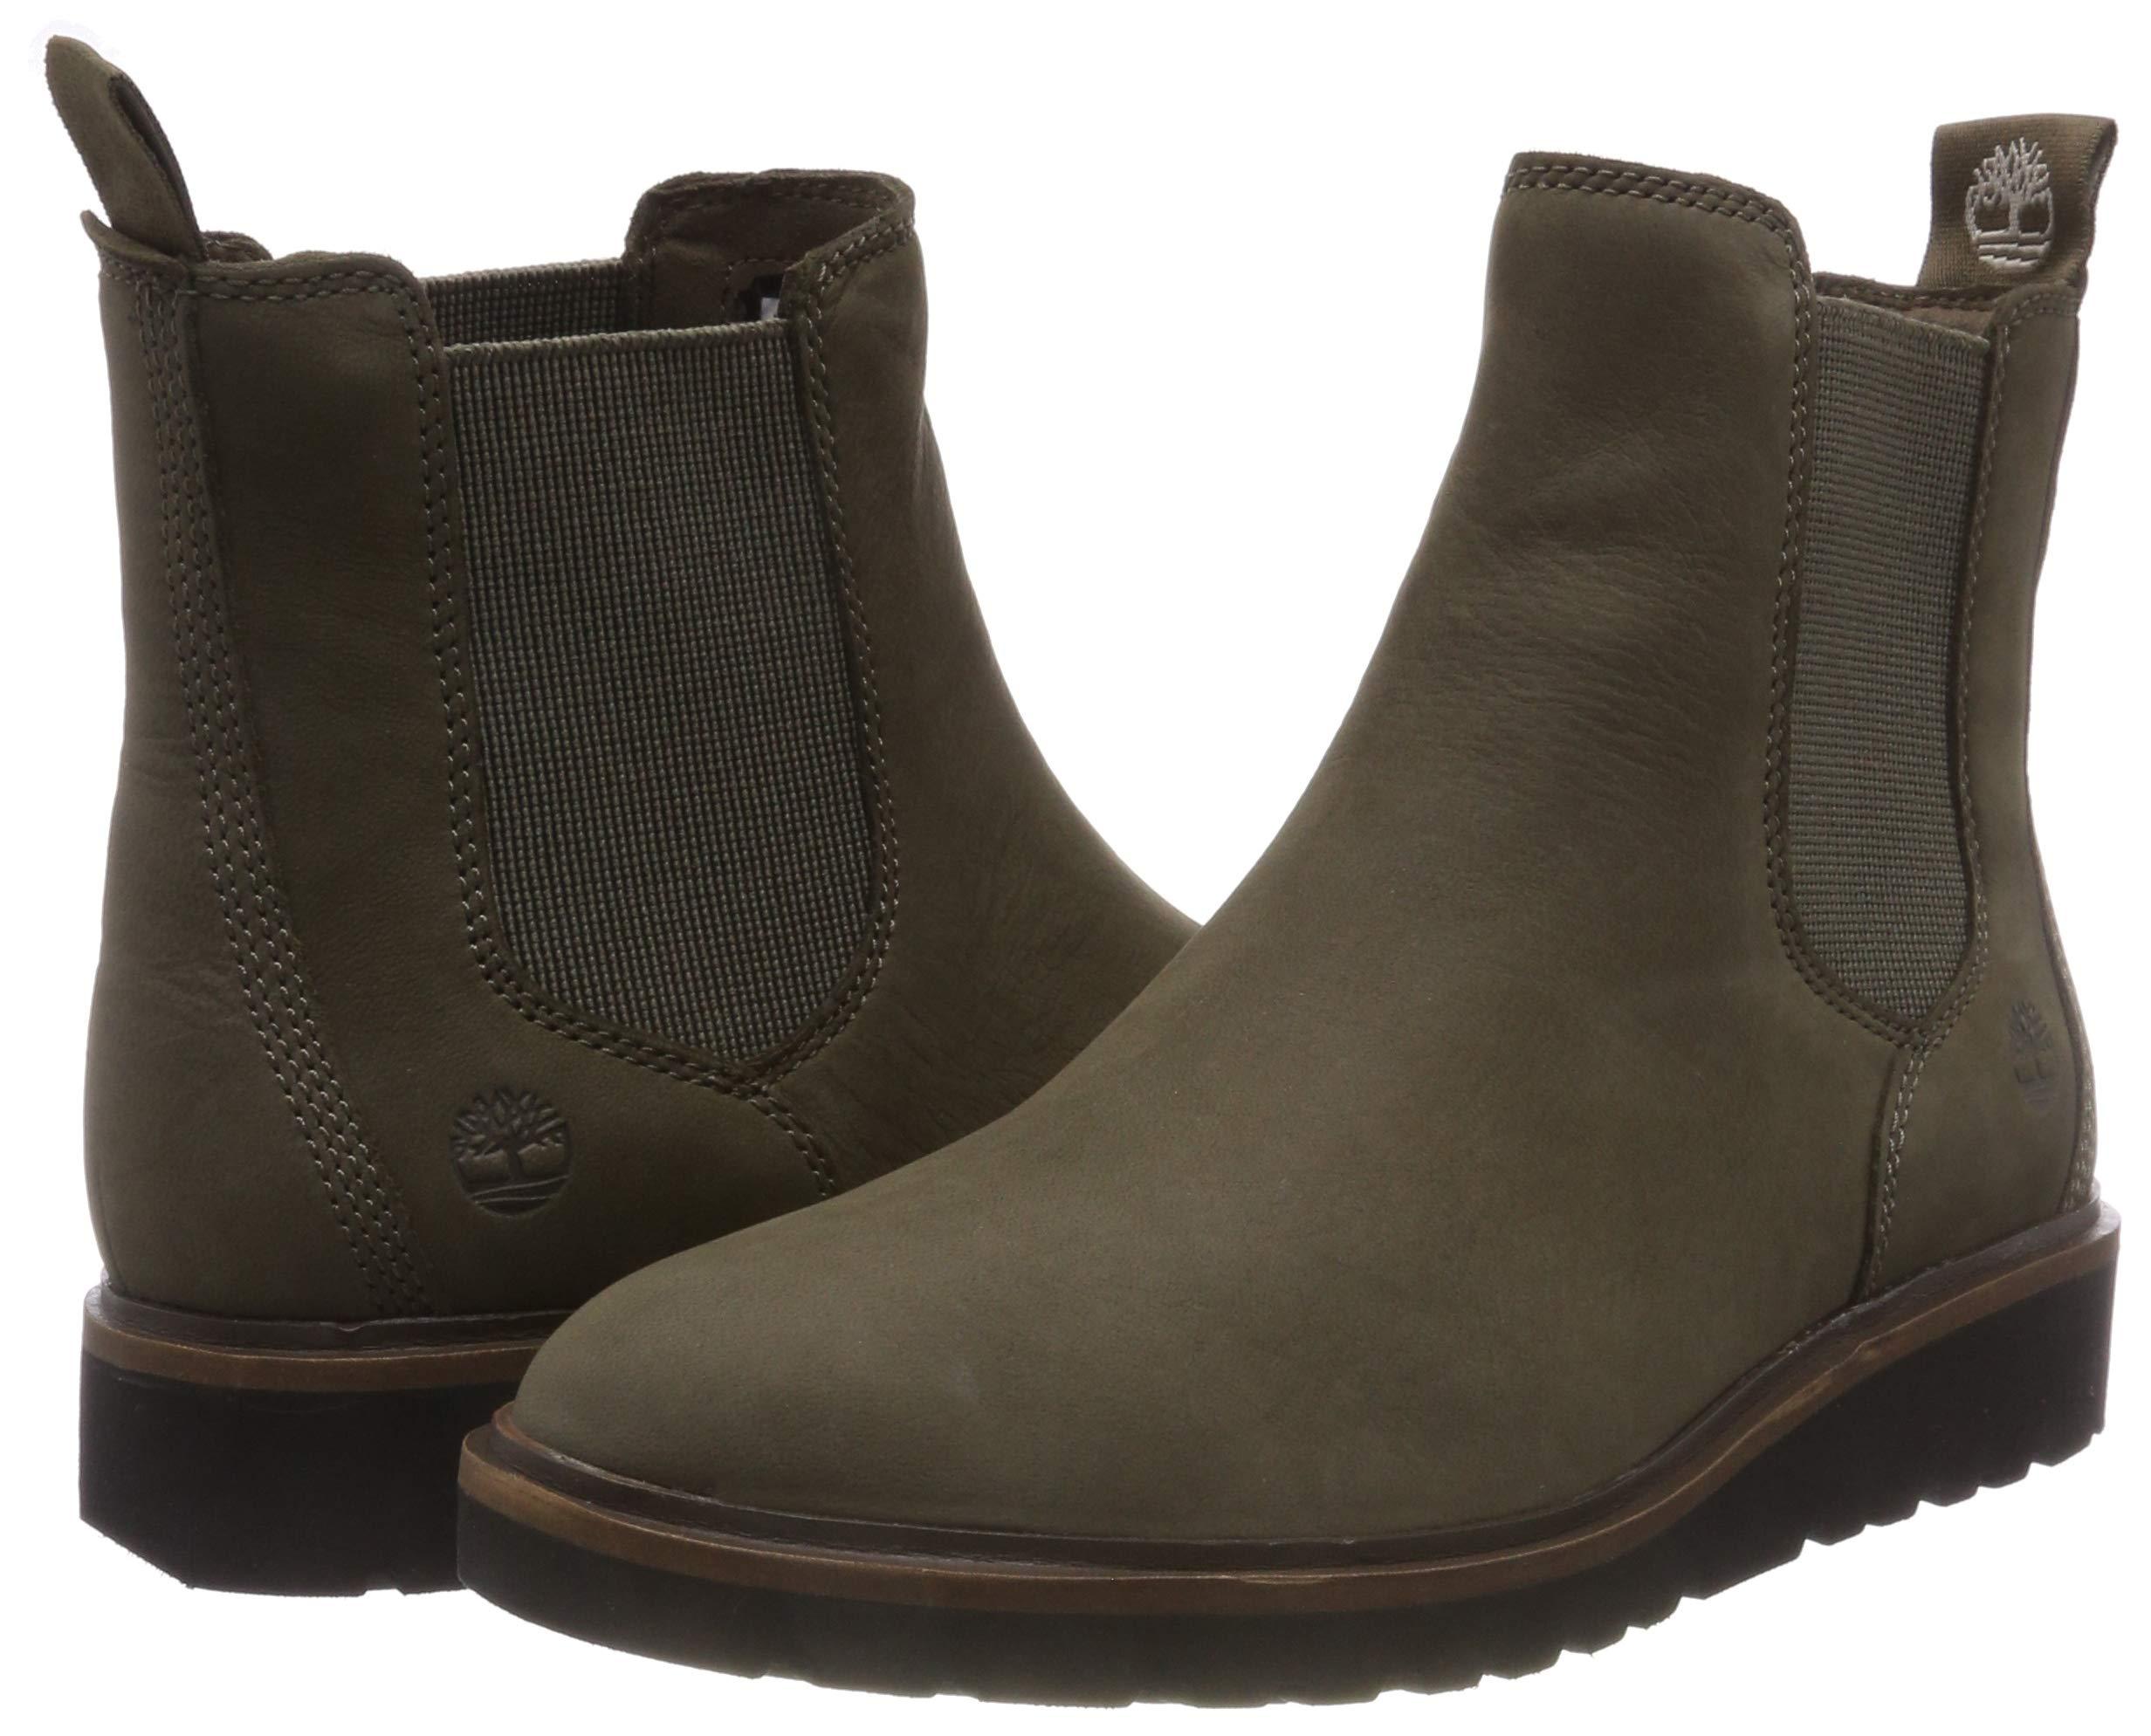 Ellis Street Chelsea Boots